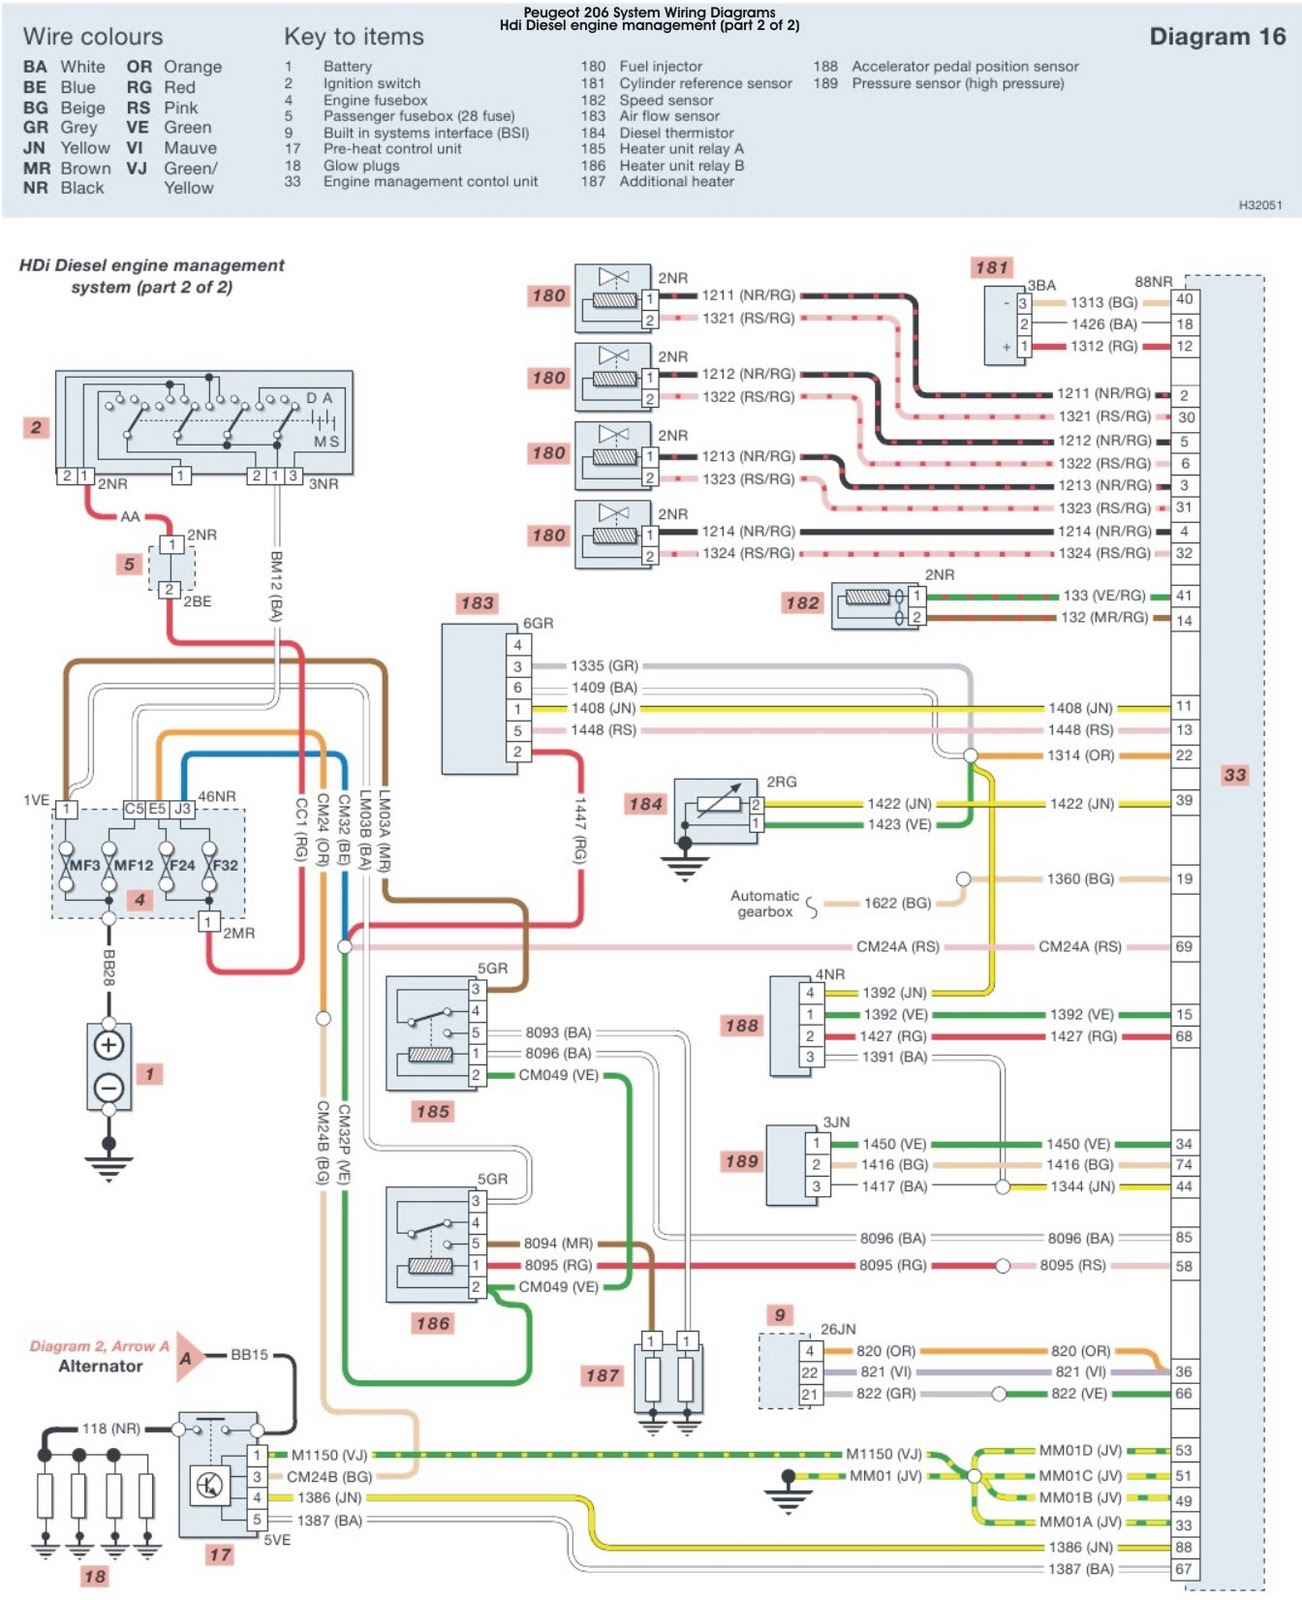 radio wiring diagram within 205 nissan almera ecu pinout maxima im trying [ 1302 x 1600 Pixel ]